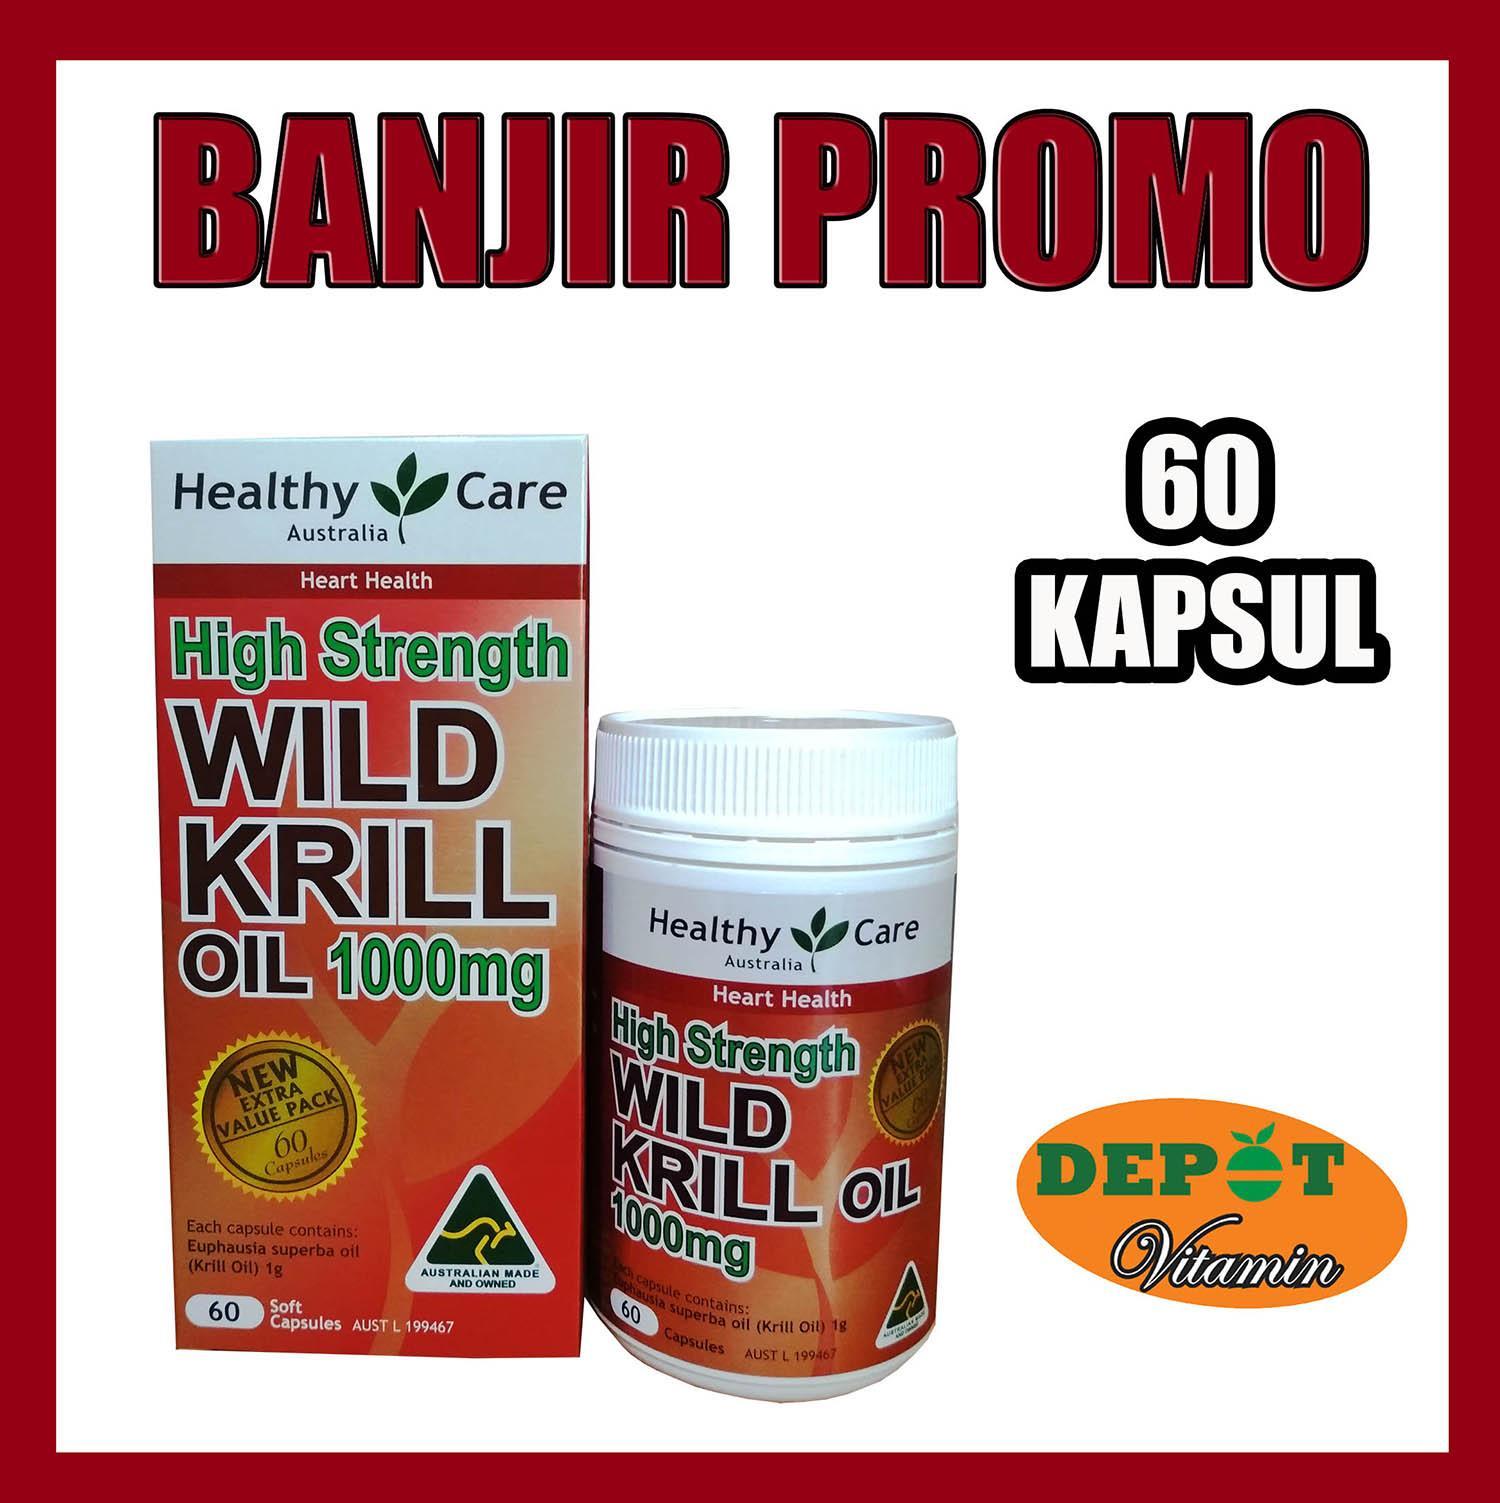 Kalbe Health Happiness H2 Superba Krill Oil 30s Obatkolesterol Berapa Harga Source And